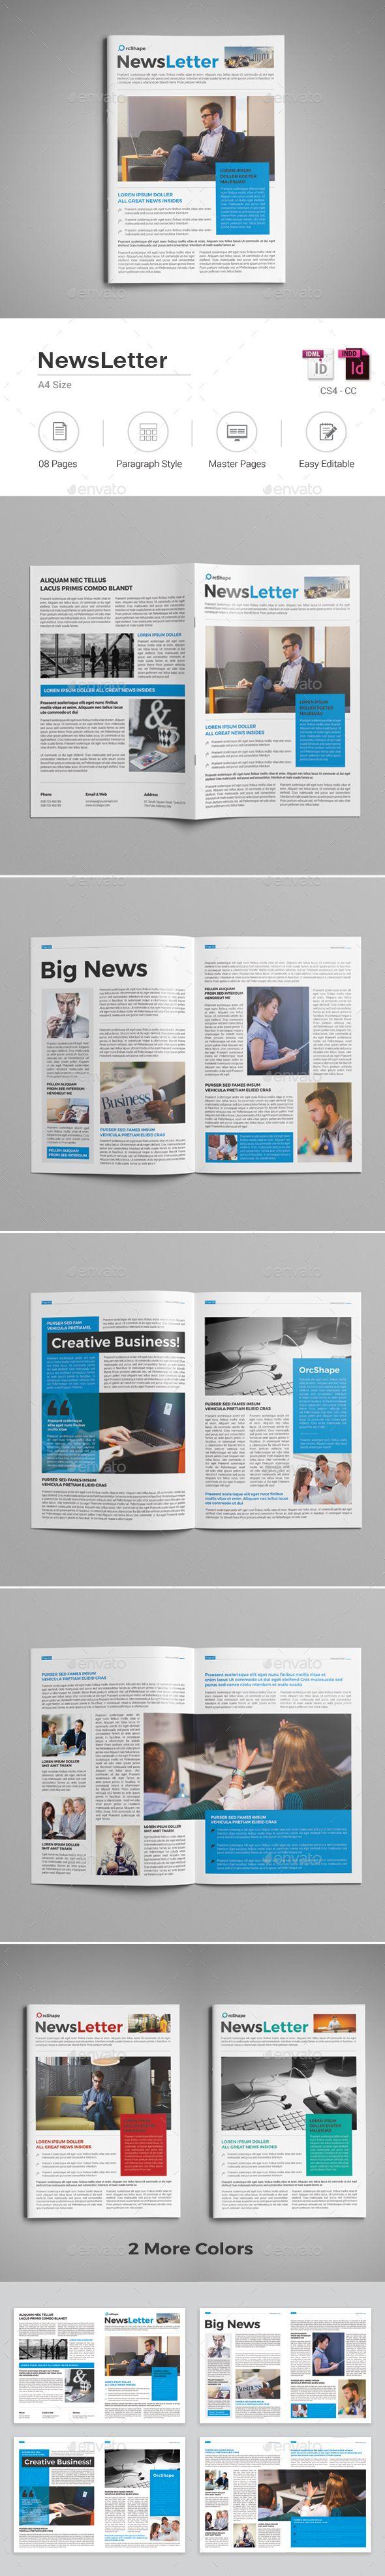 Newsletter Template InDesign INDD. Download here: https://graphicriver.net/item/newsletter-template/17596464?ref=ksioks